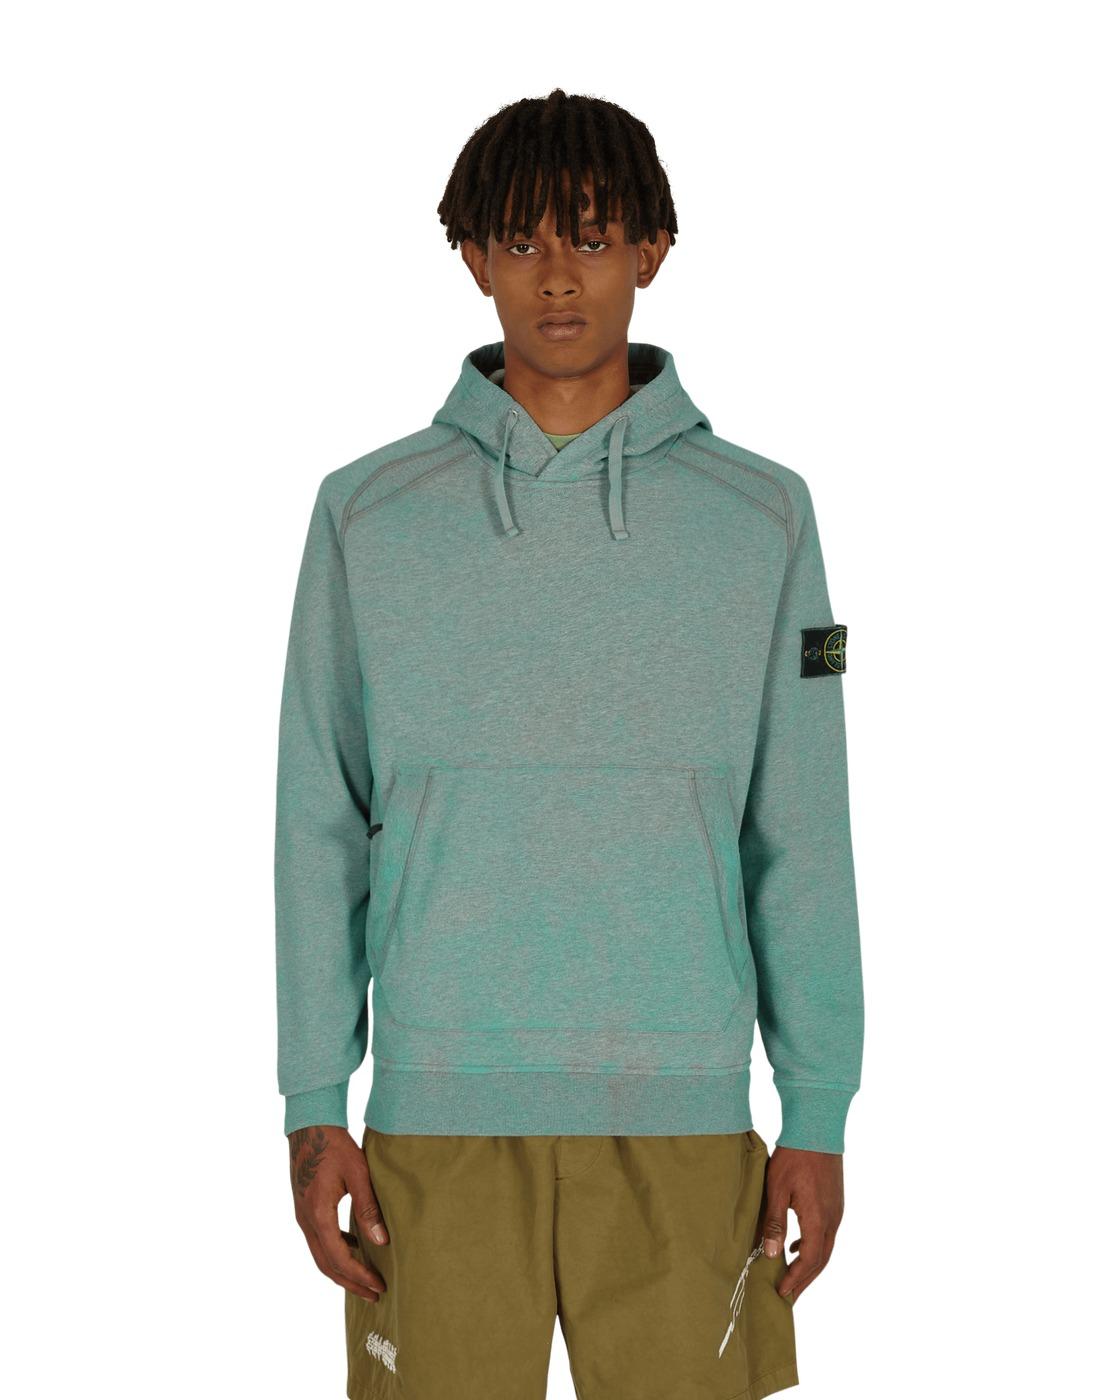 Stone Island Dust Color Treatment Hooded Sweatshirt Aqua